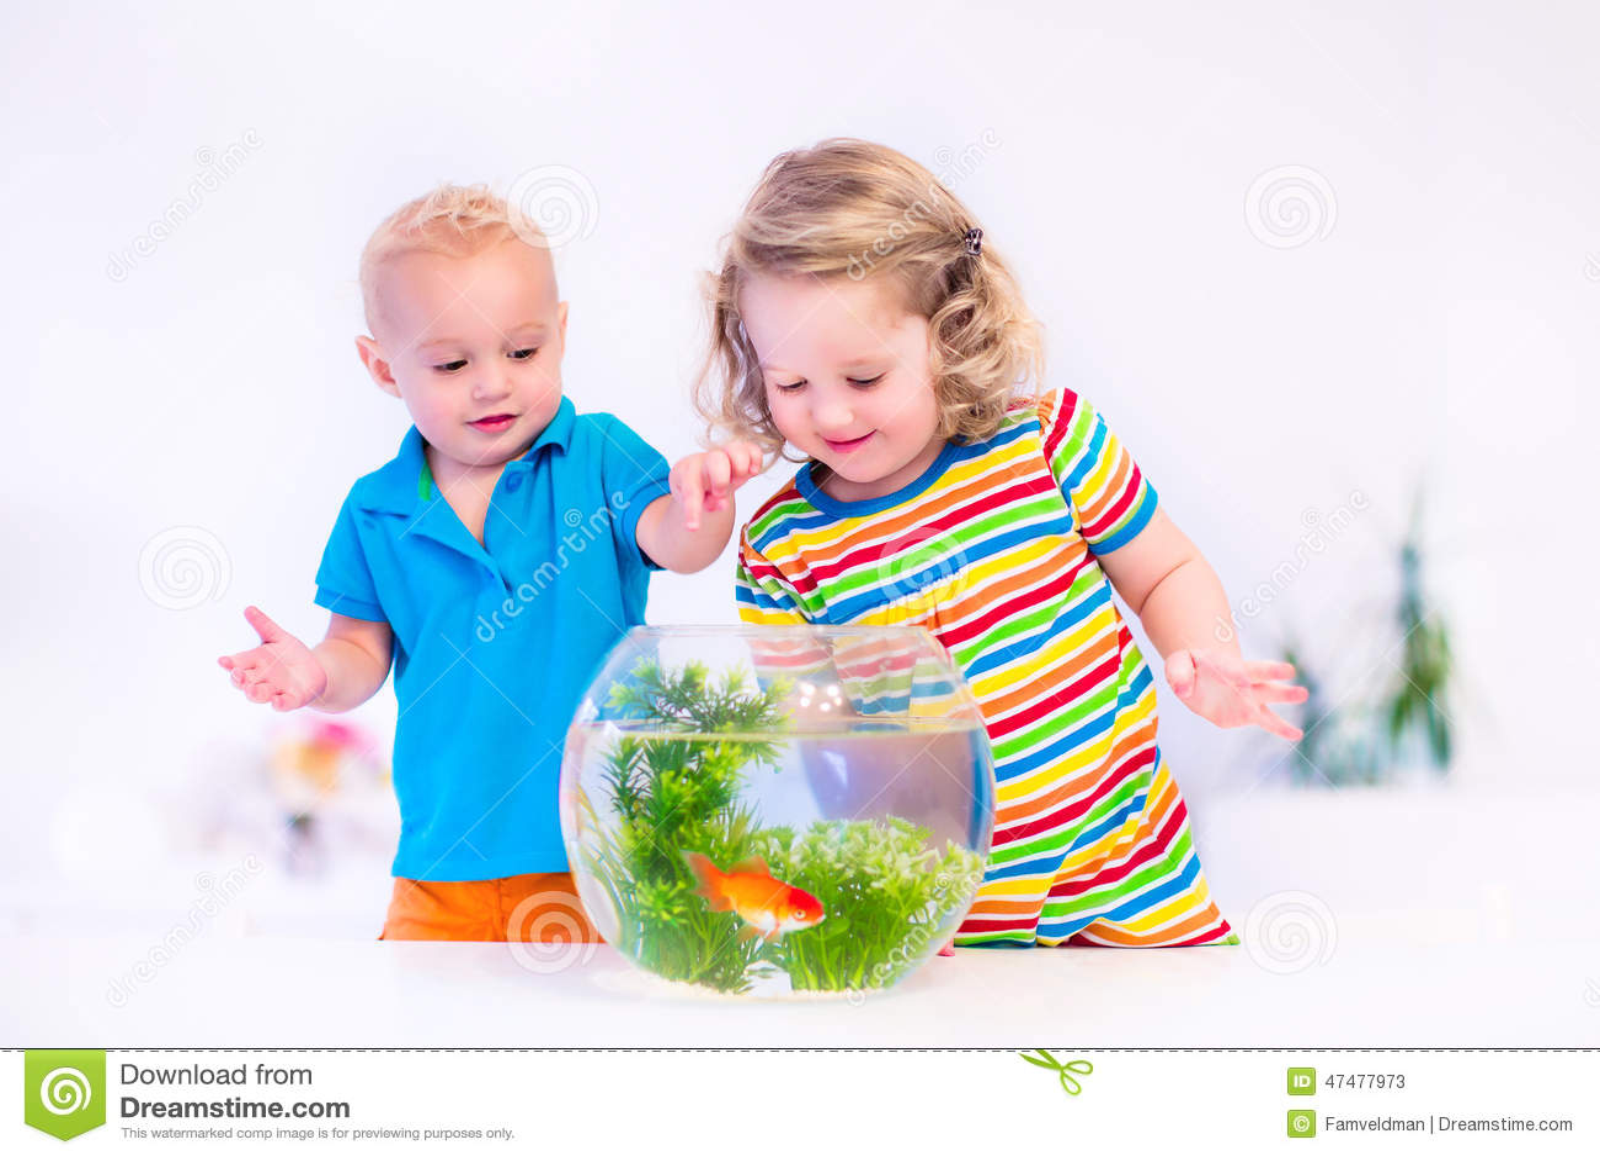 Kids Watching Fish Bowl Stock Photo Image 47477973